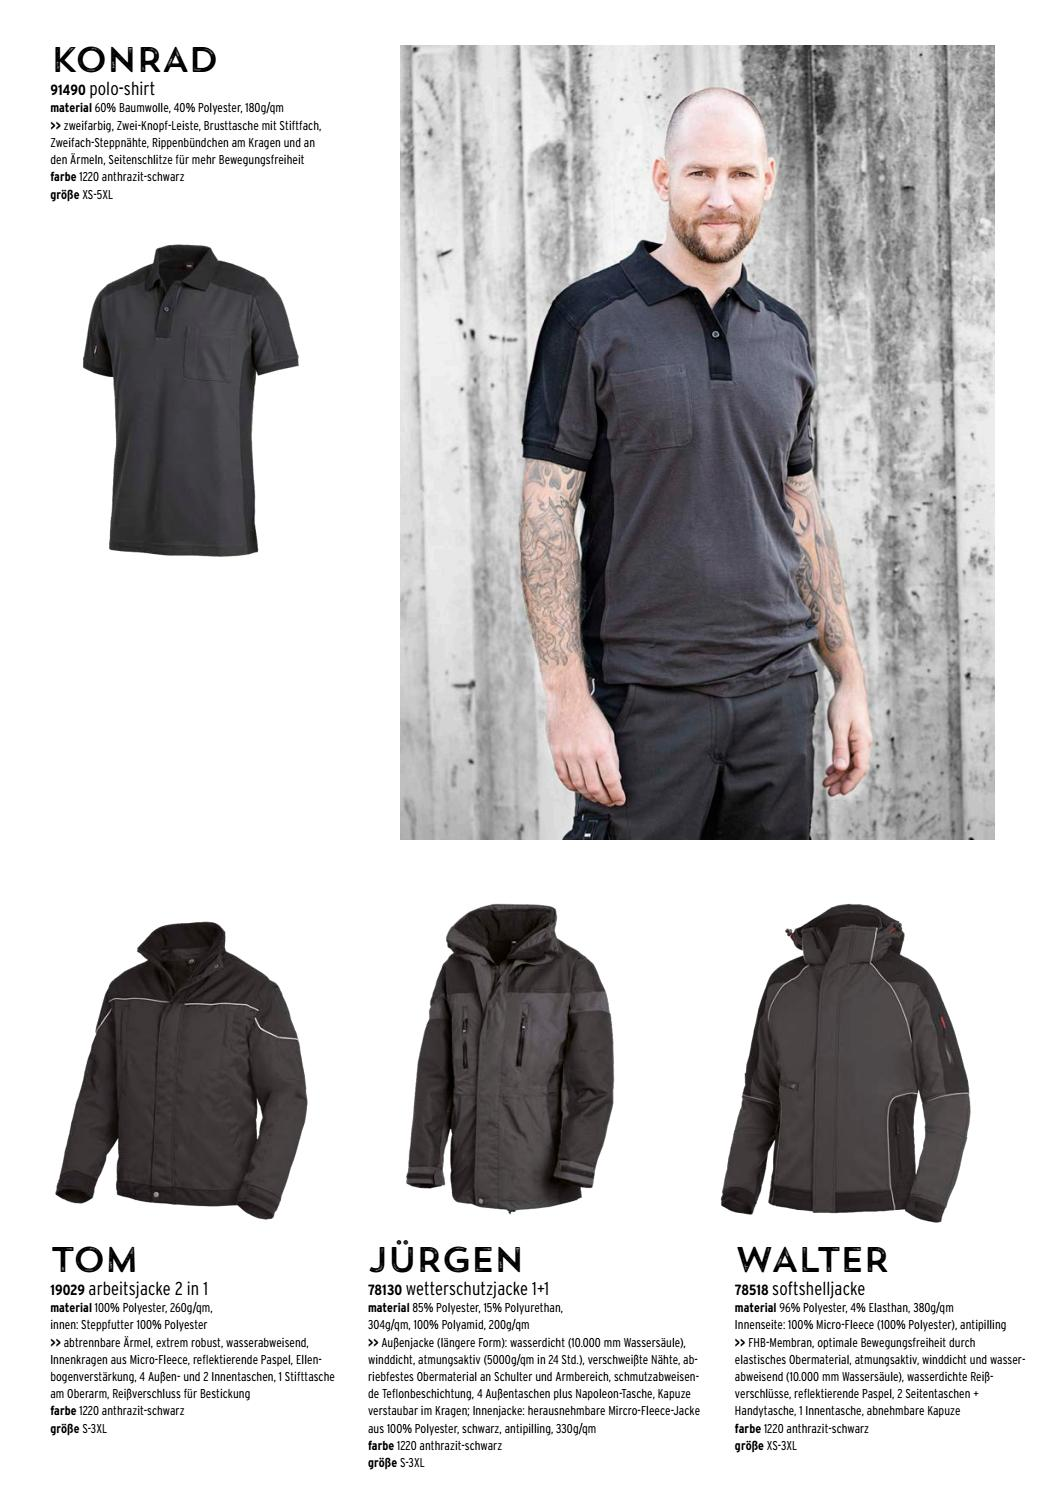 FHB Polo-Shirt  KONRAD 91490 1220-anthrazit-schwarz